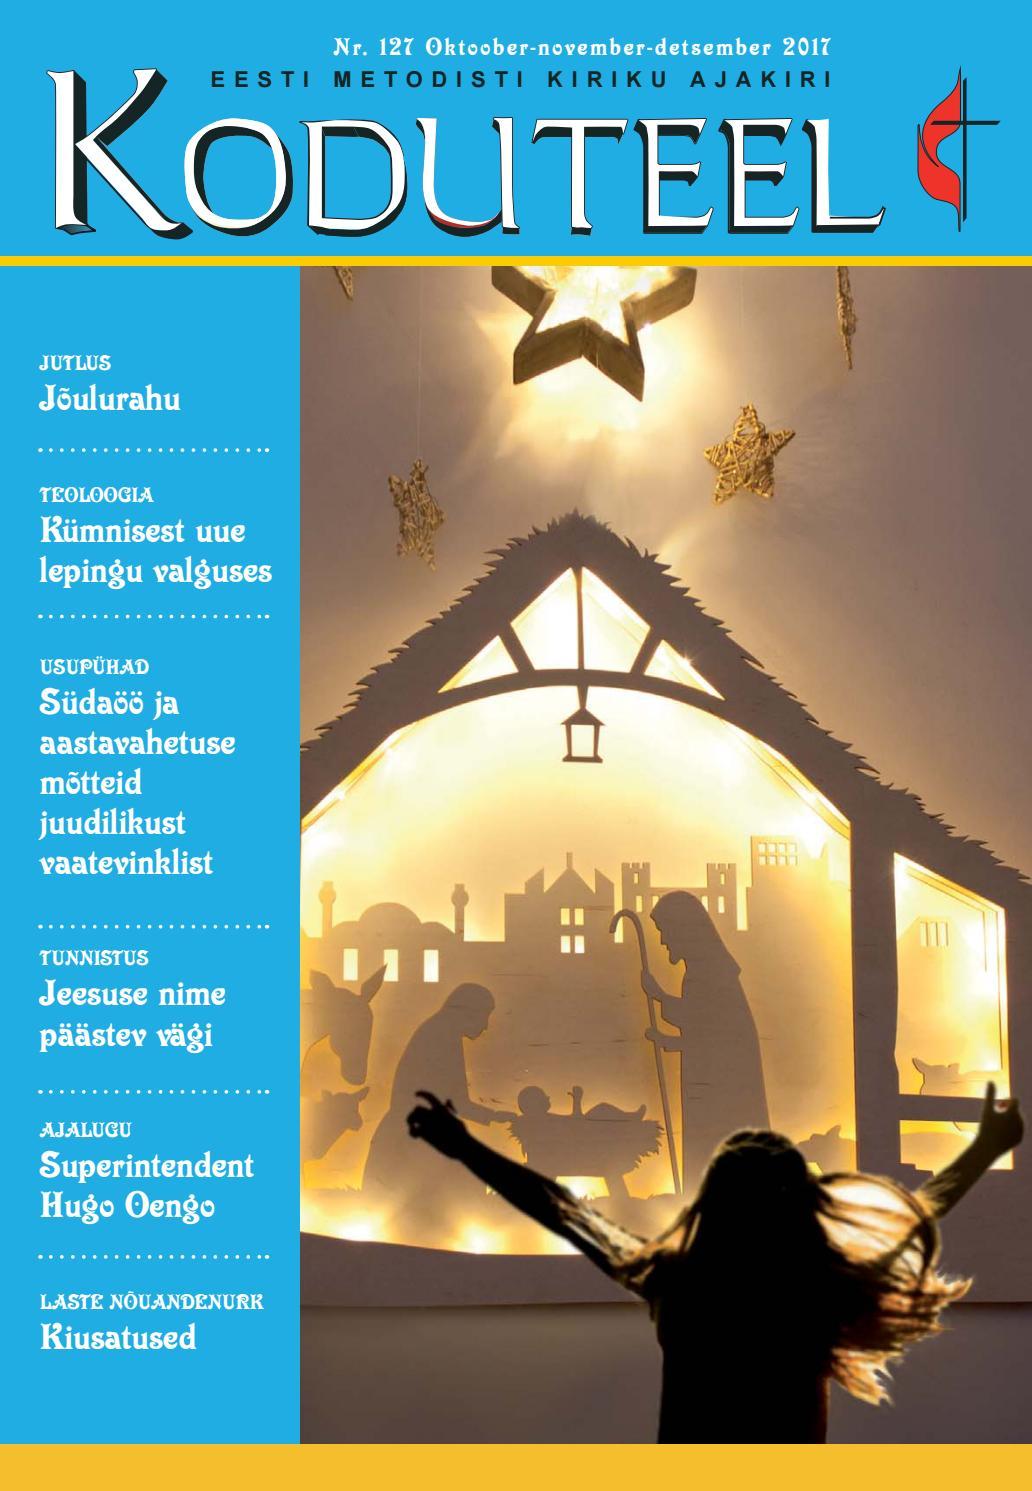 62b0b658379 Koduteel 4 (127) 2017 by Eesti Metodisti Kiriku ajakiri Koduteel - issuu